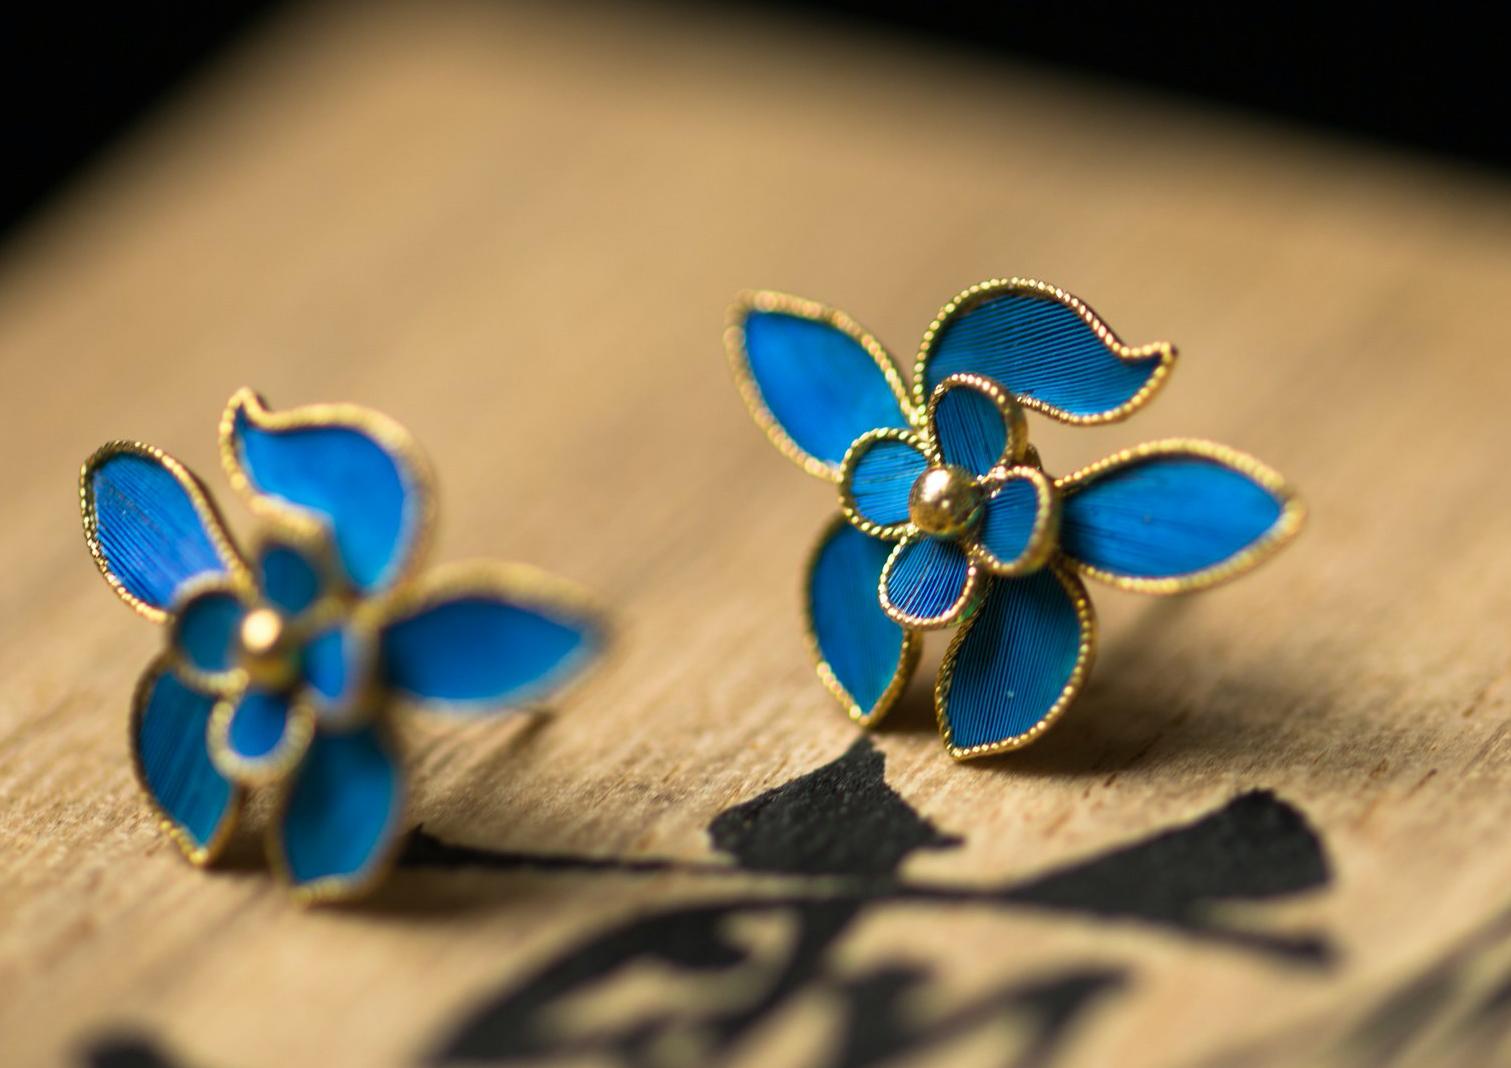 Modern Tian-tsui jewelry from Shang Tang Peony